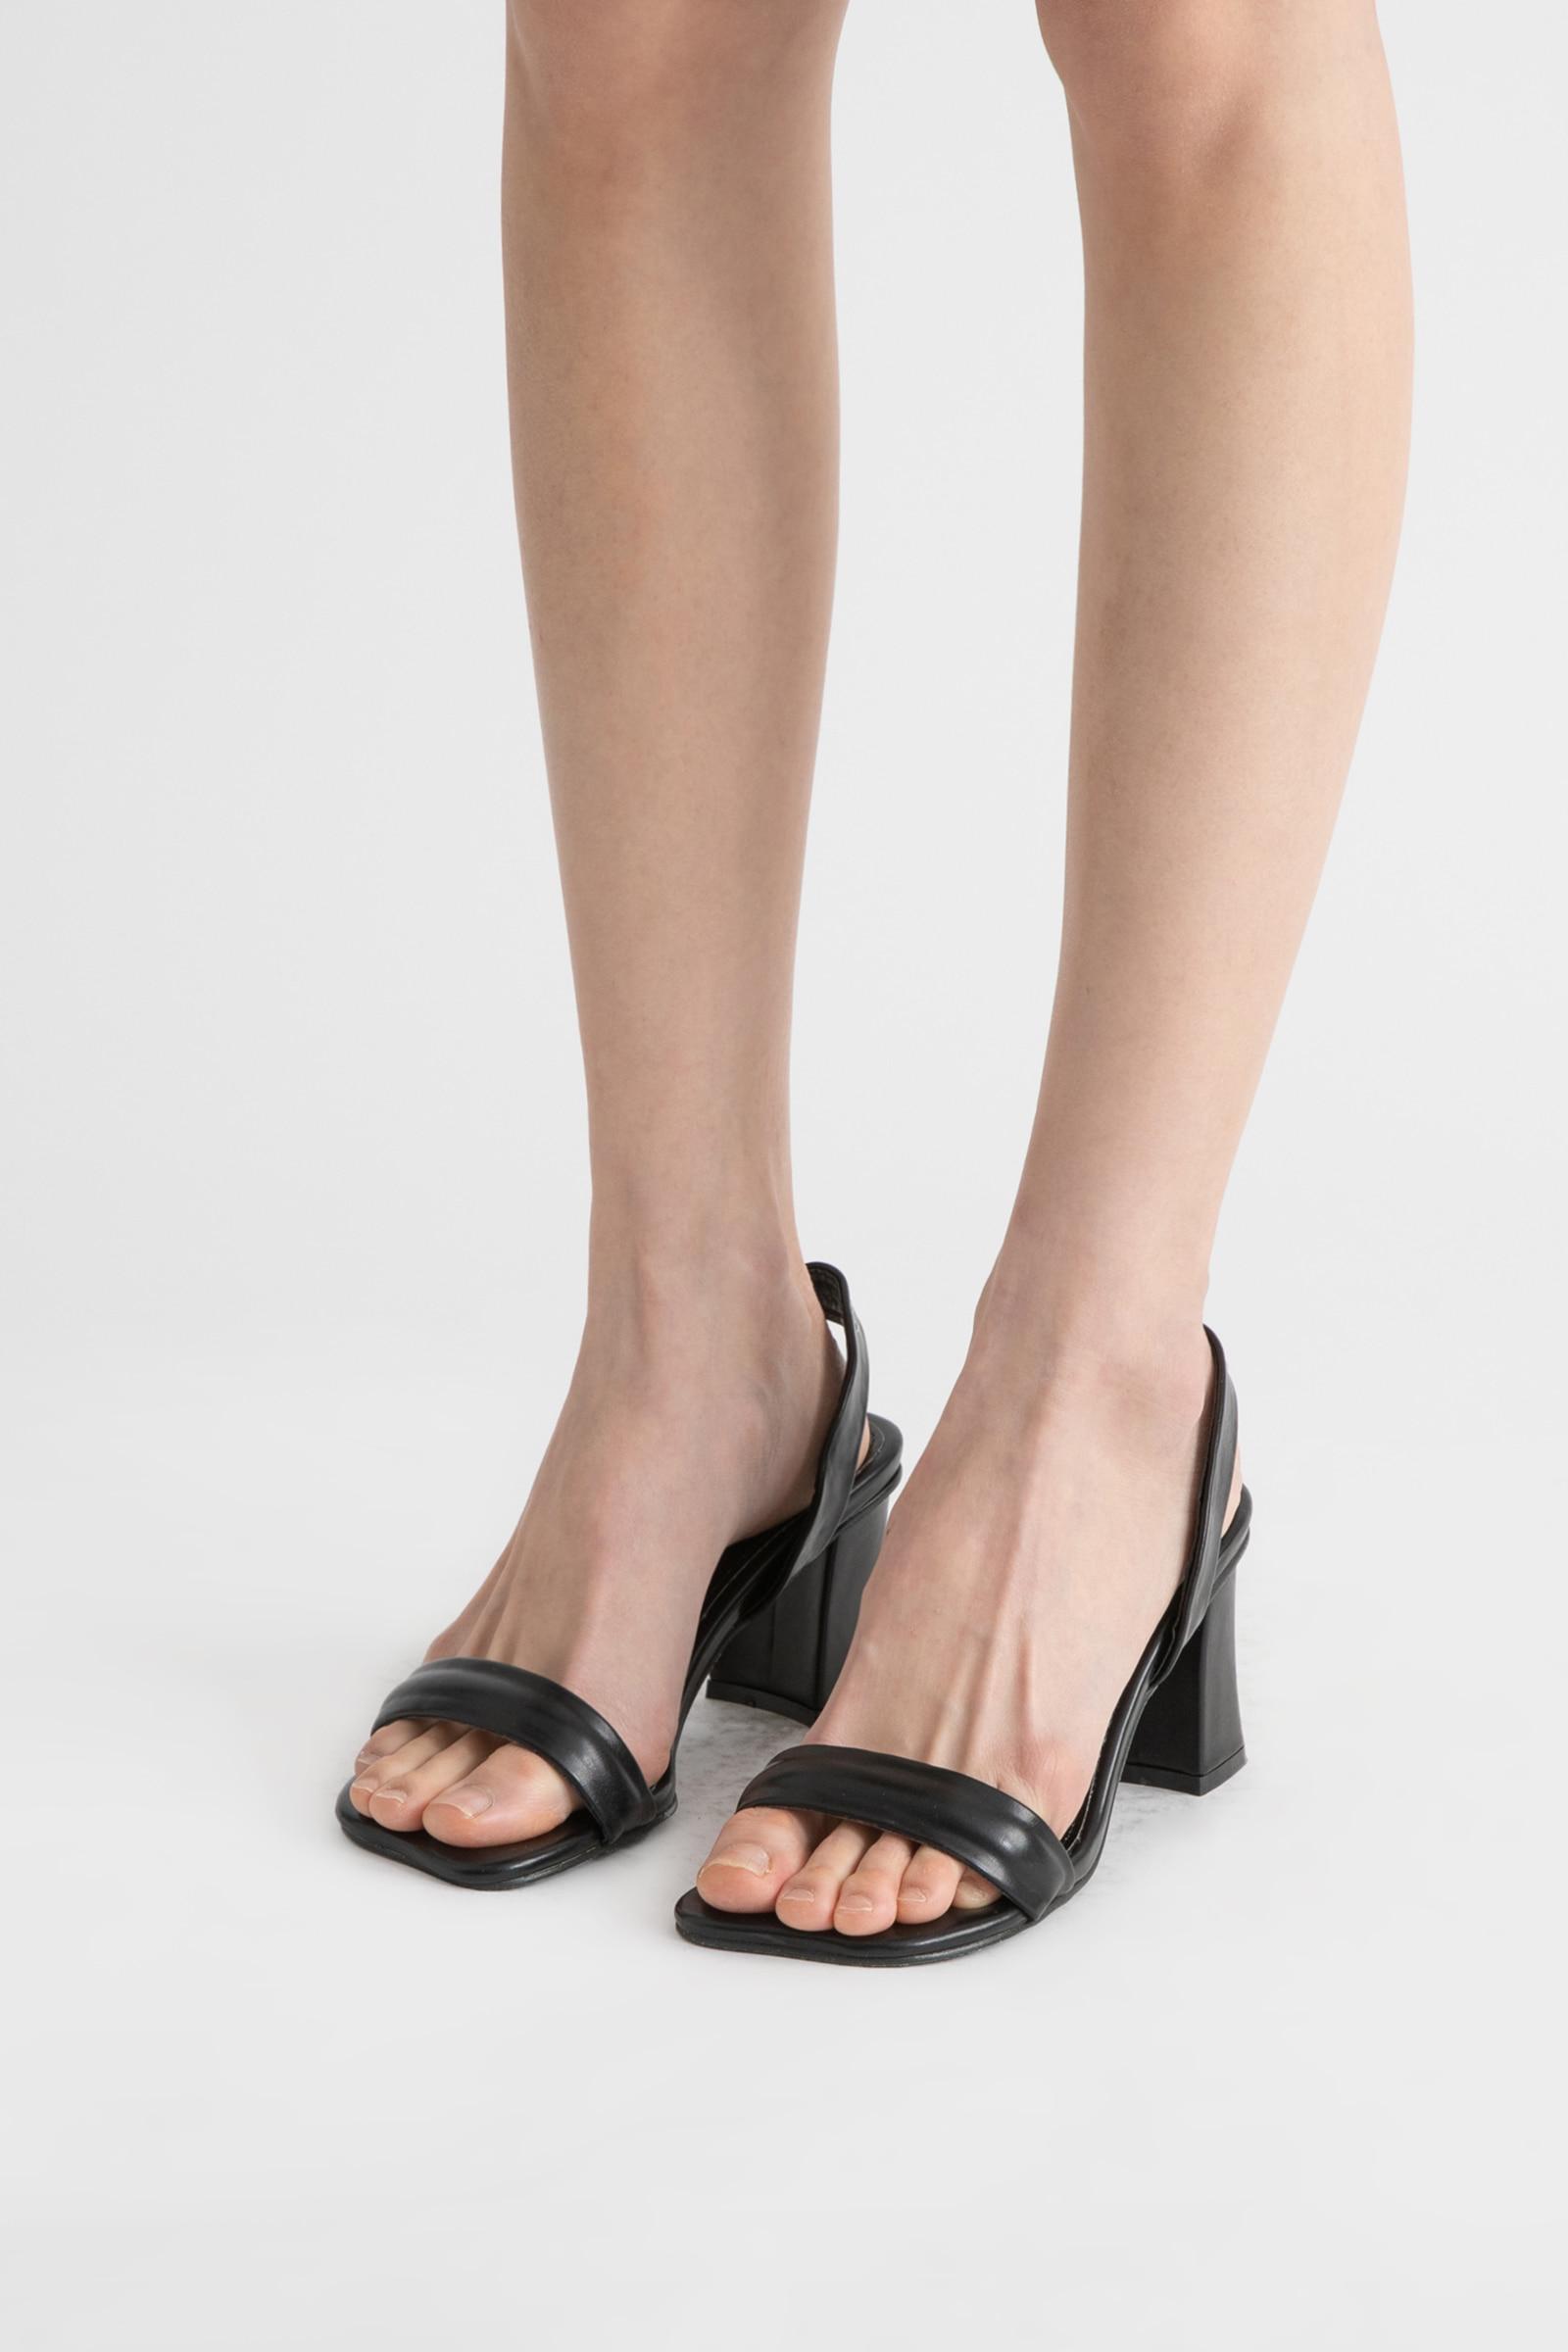 Pier curve high heel sandals